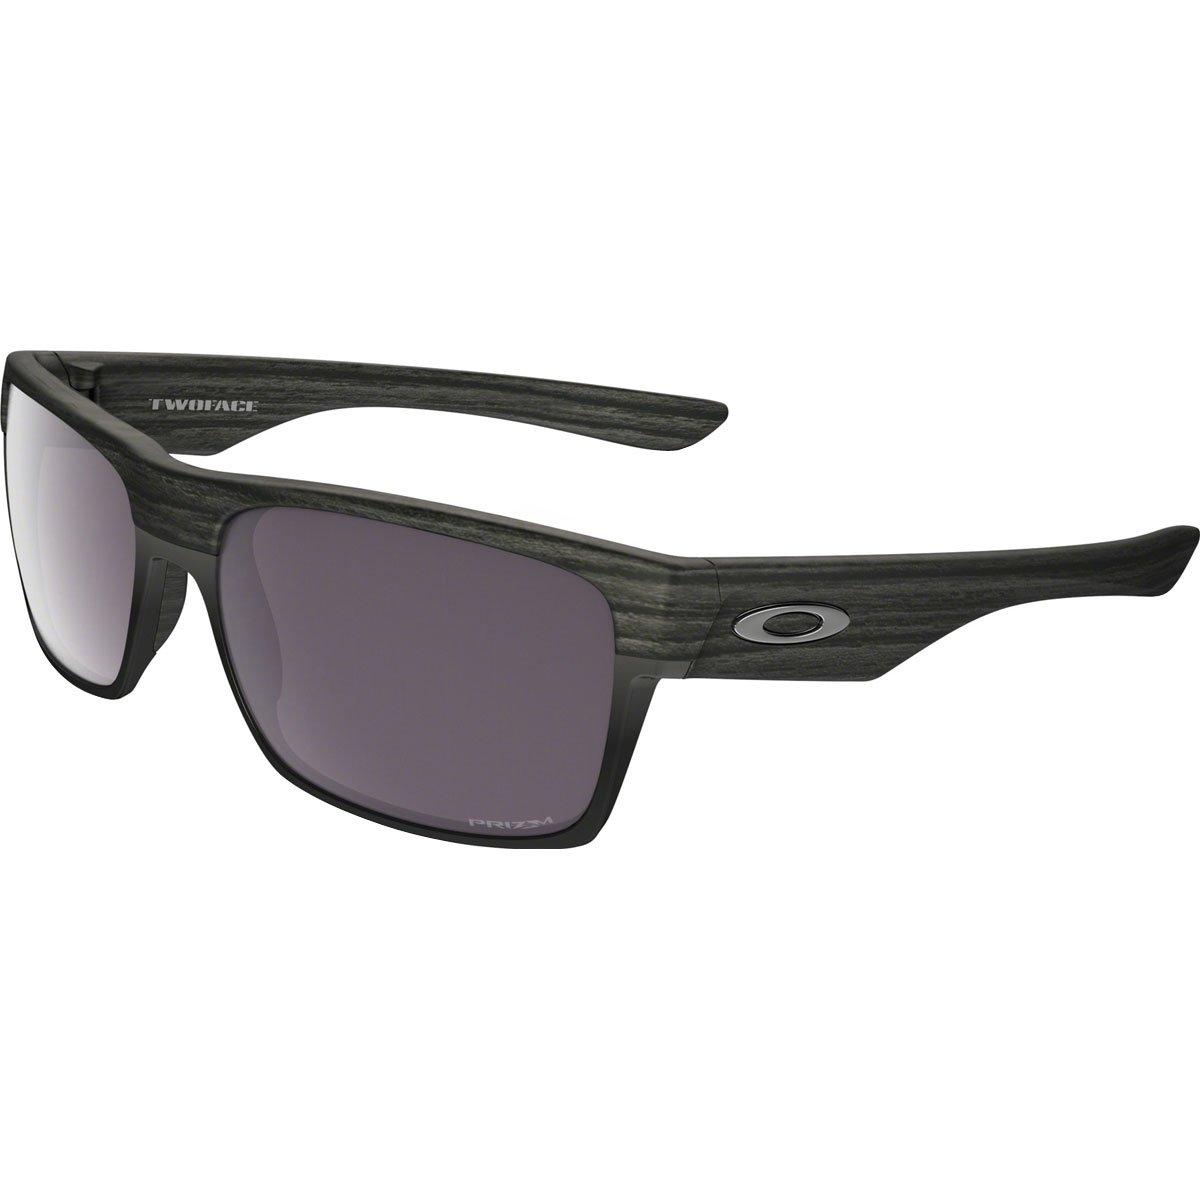 Oakley Men's OO9189 TwoFace Square Sunglasses, Woodgrain/Prizm Daily Polarized, 60 mm by Oakley